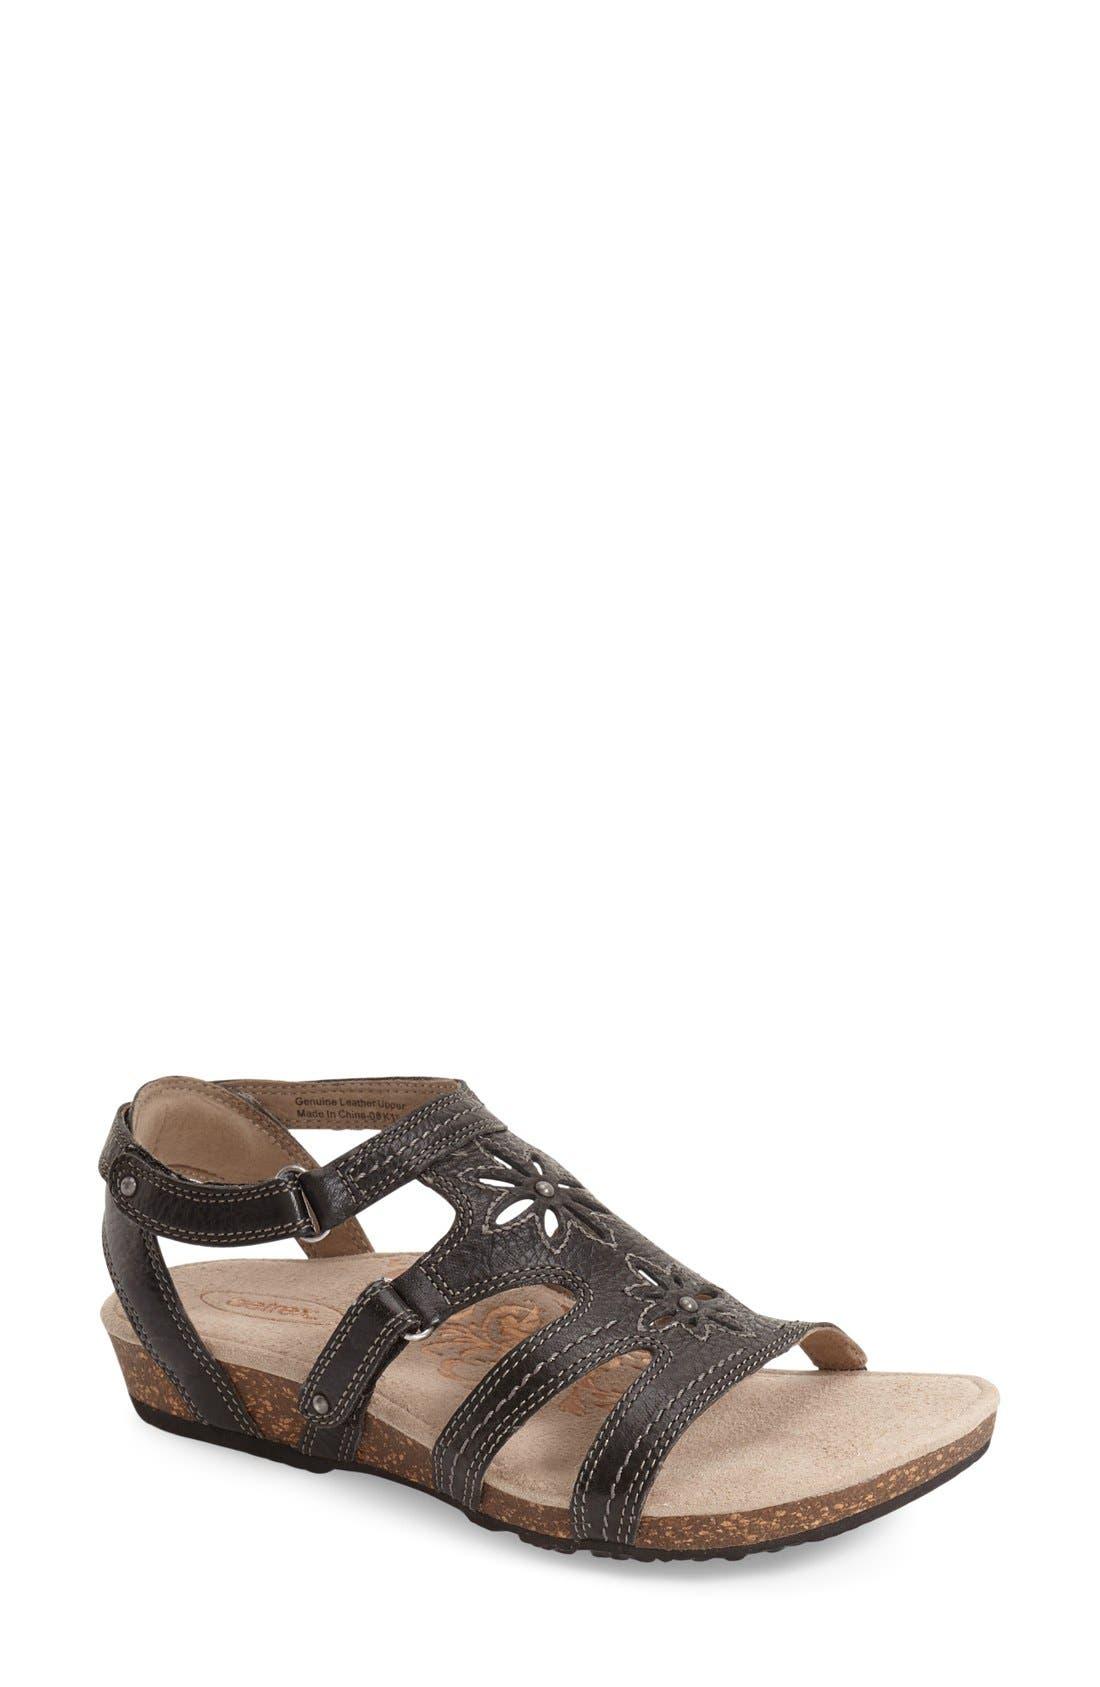 'Natasha' Gladiator Sandal,                         Main,                         color, 001